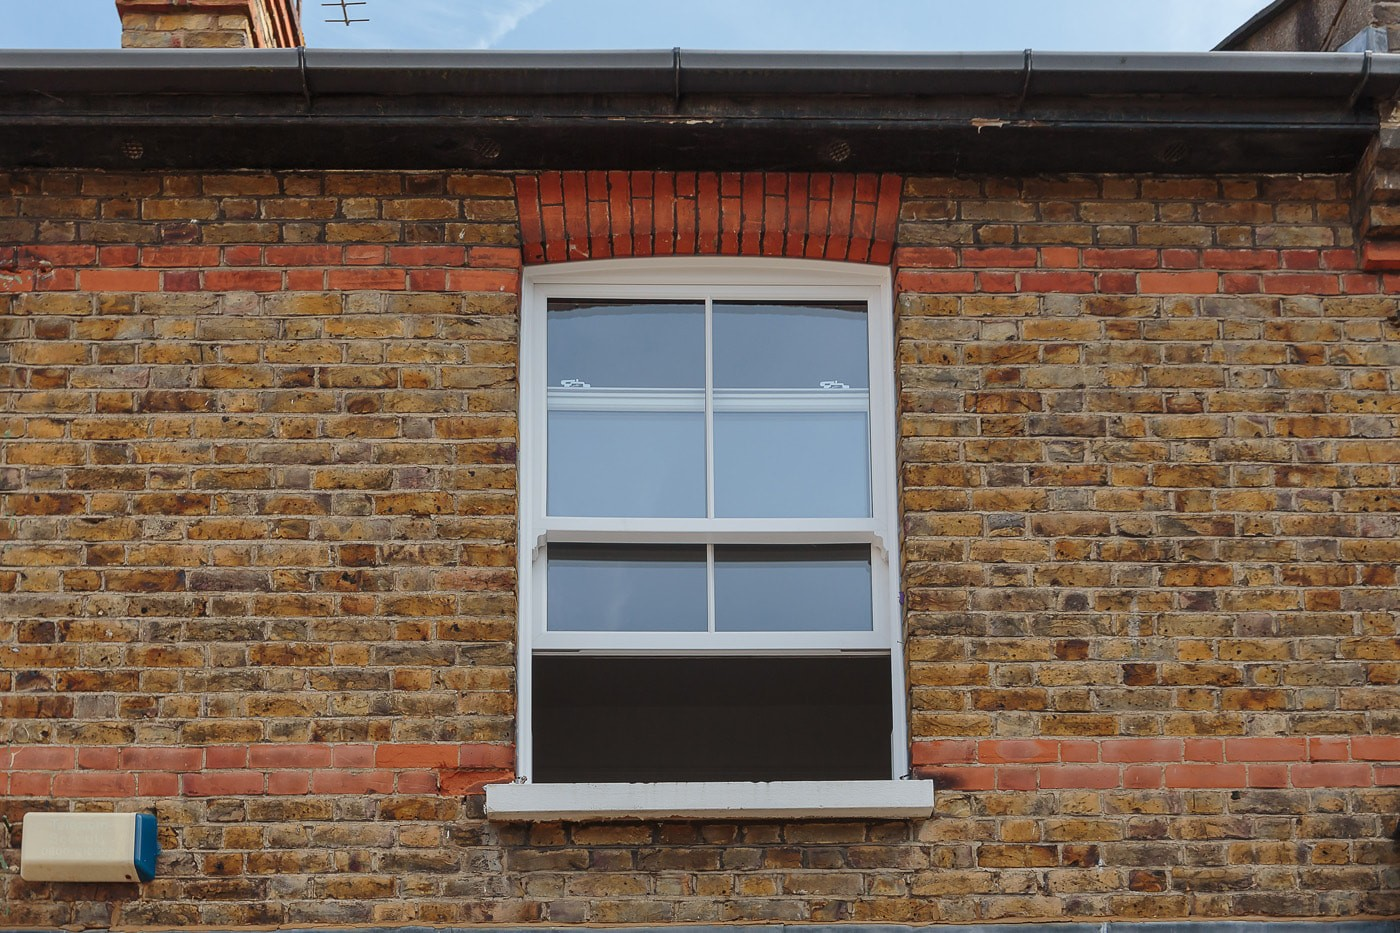 New double glazed sash windows kingston upon thames from Hamiltons